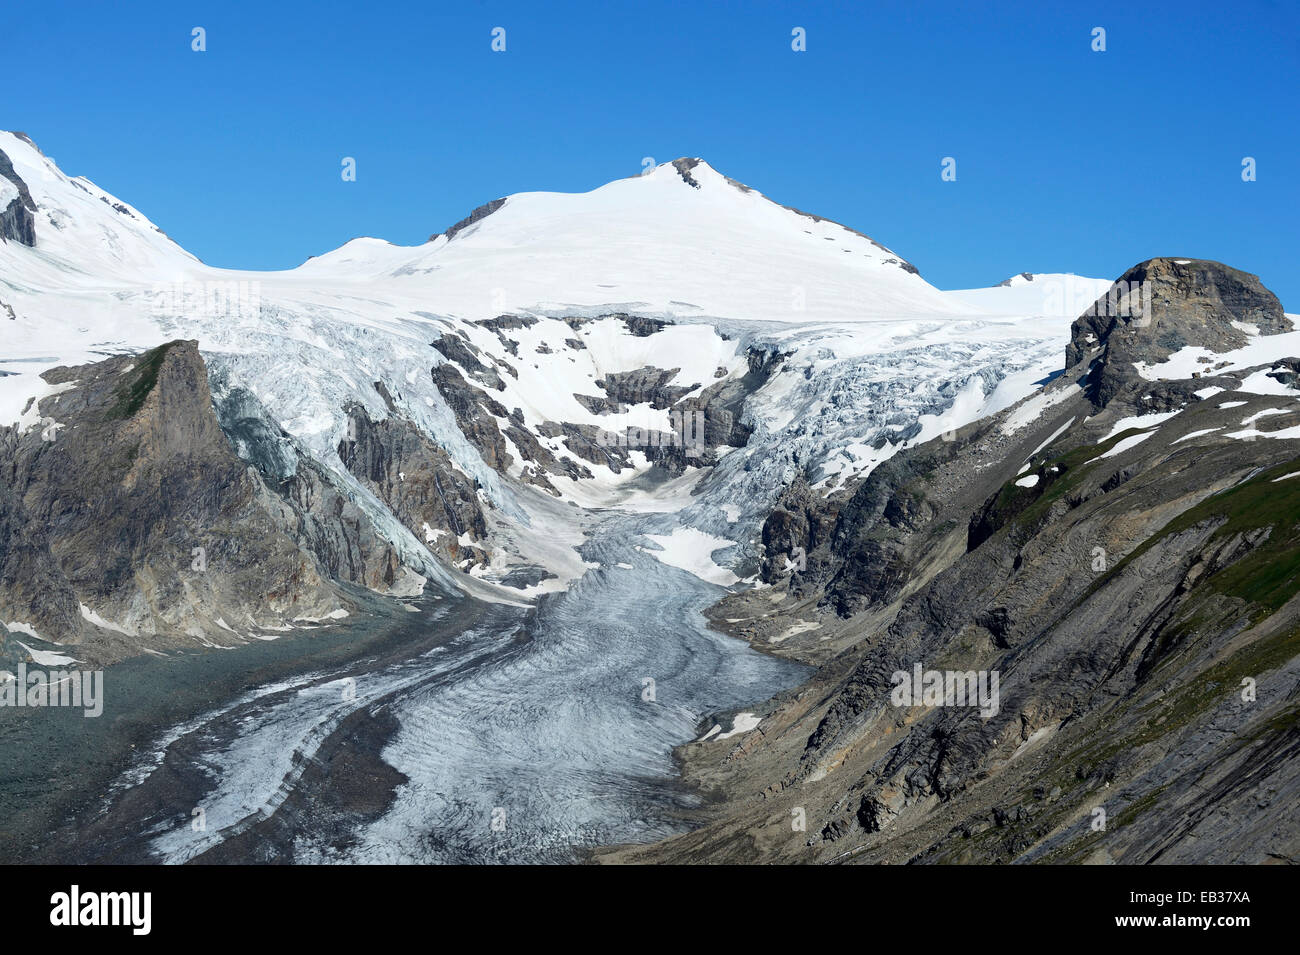 Pasterze Glacier, Mt Johannisberg at back, Kaiser-Franz-Josefs-Höhe, Carinthia, Austria - Stock Image